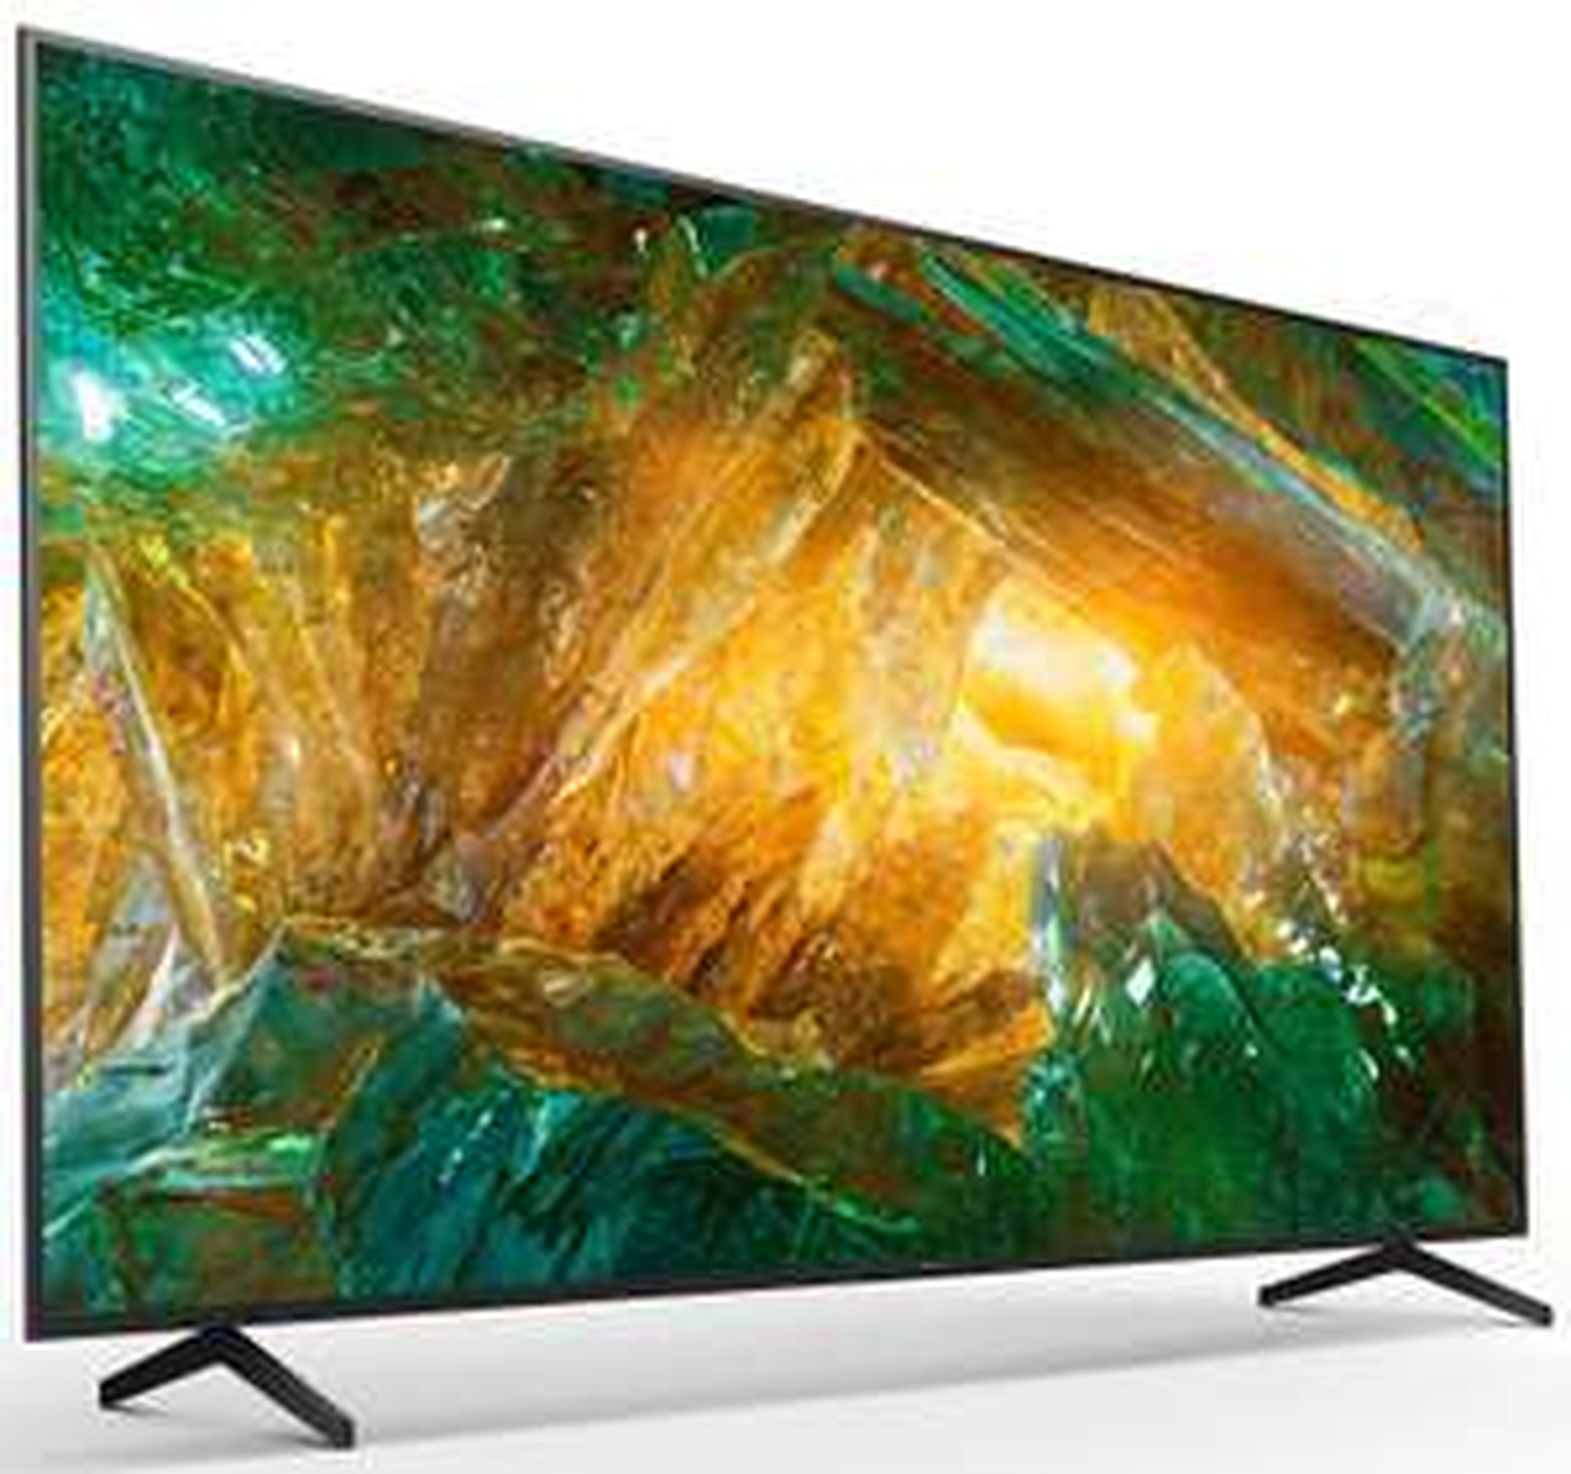 TV 65'' Sony KE-65XH8096 - 4K UHD, HDR10, Dolby Vision, Android TV